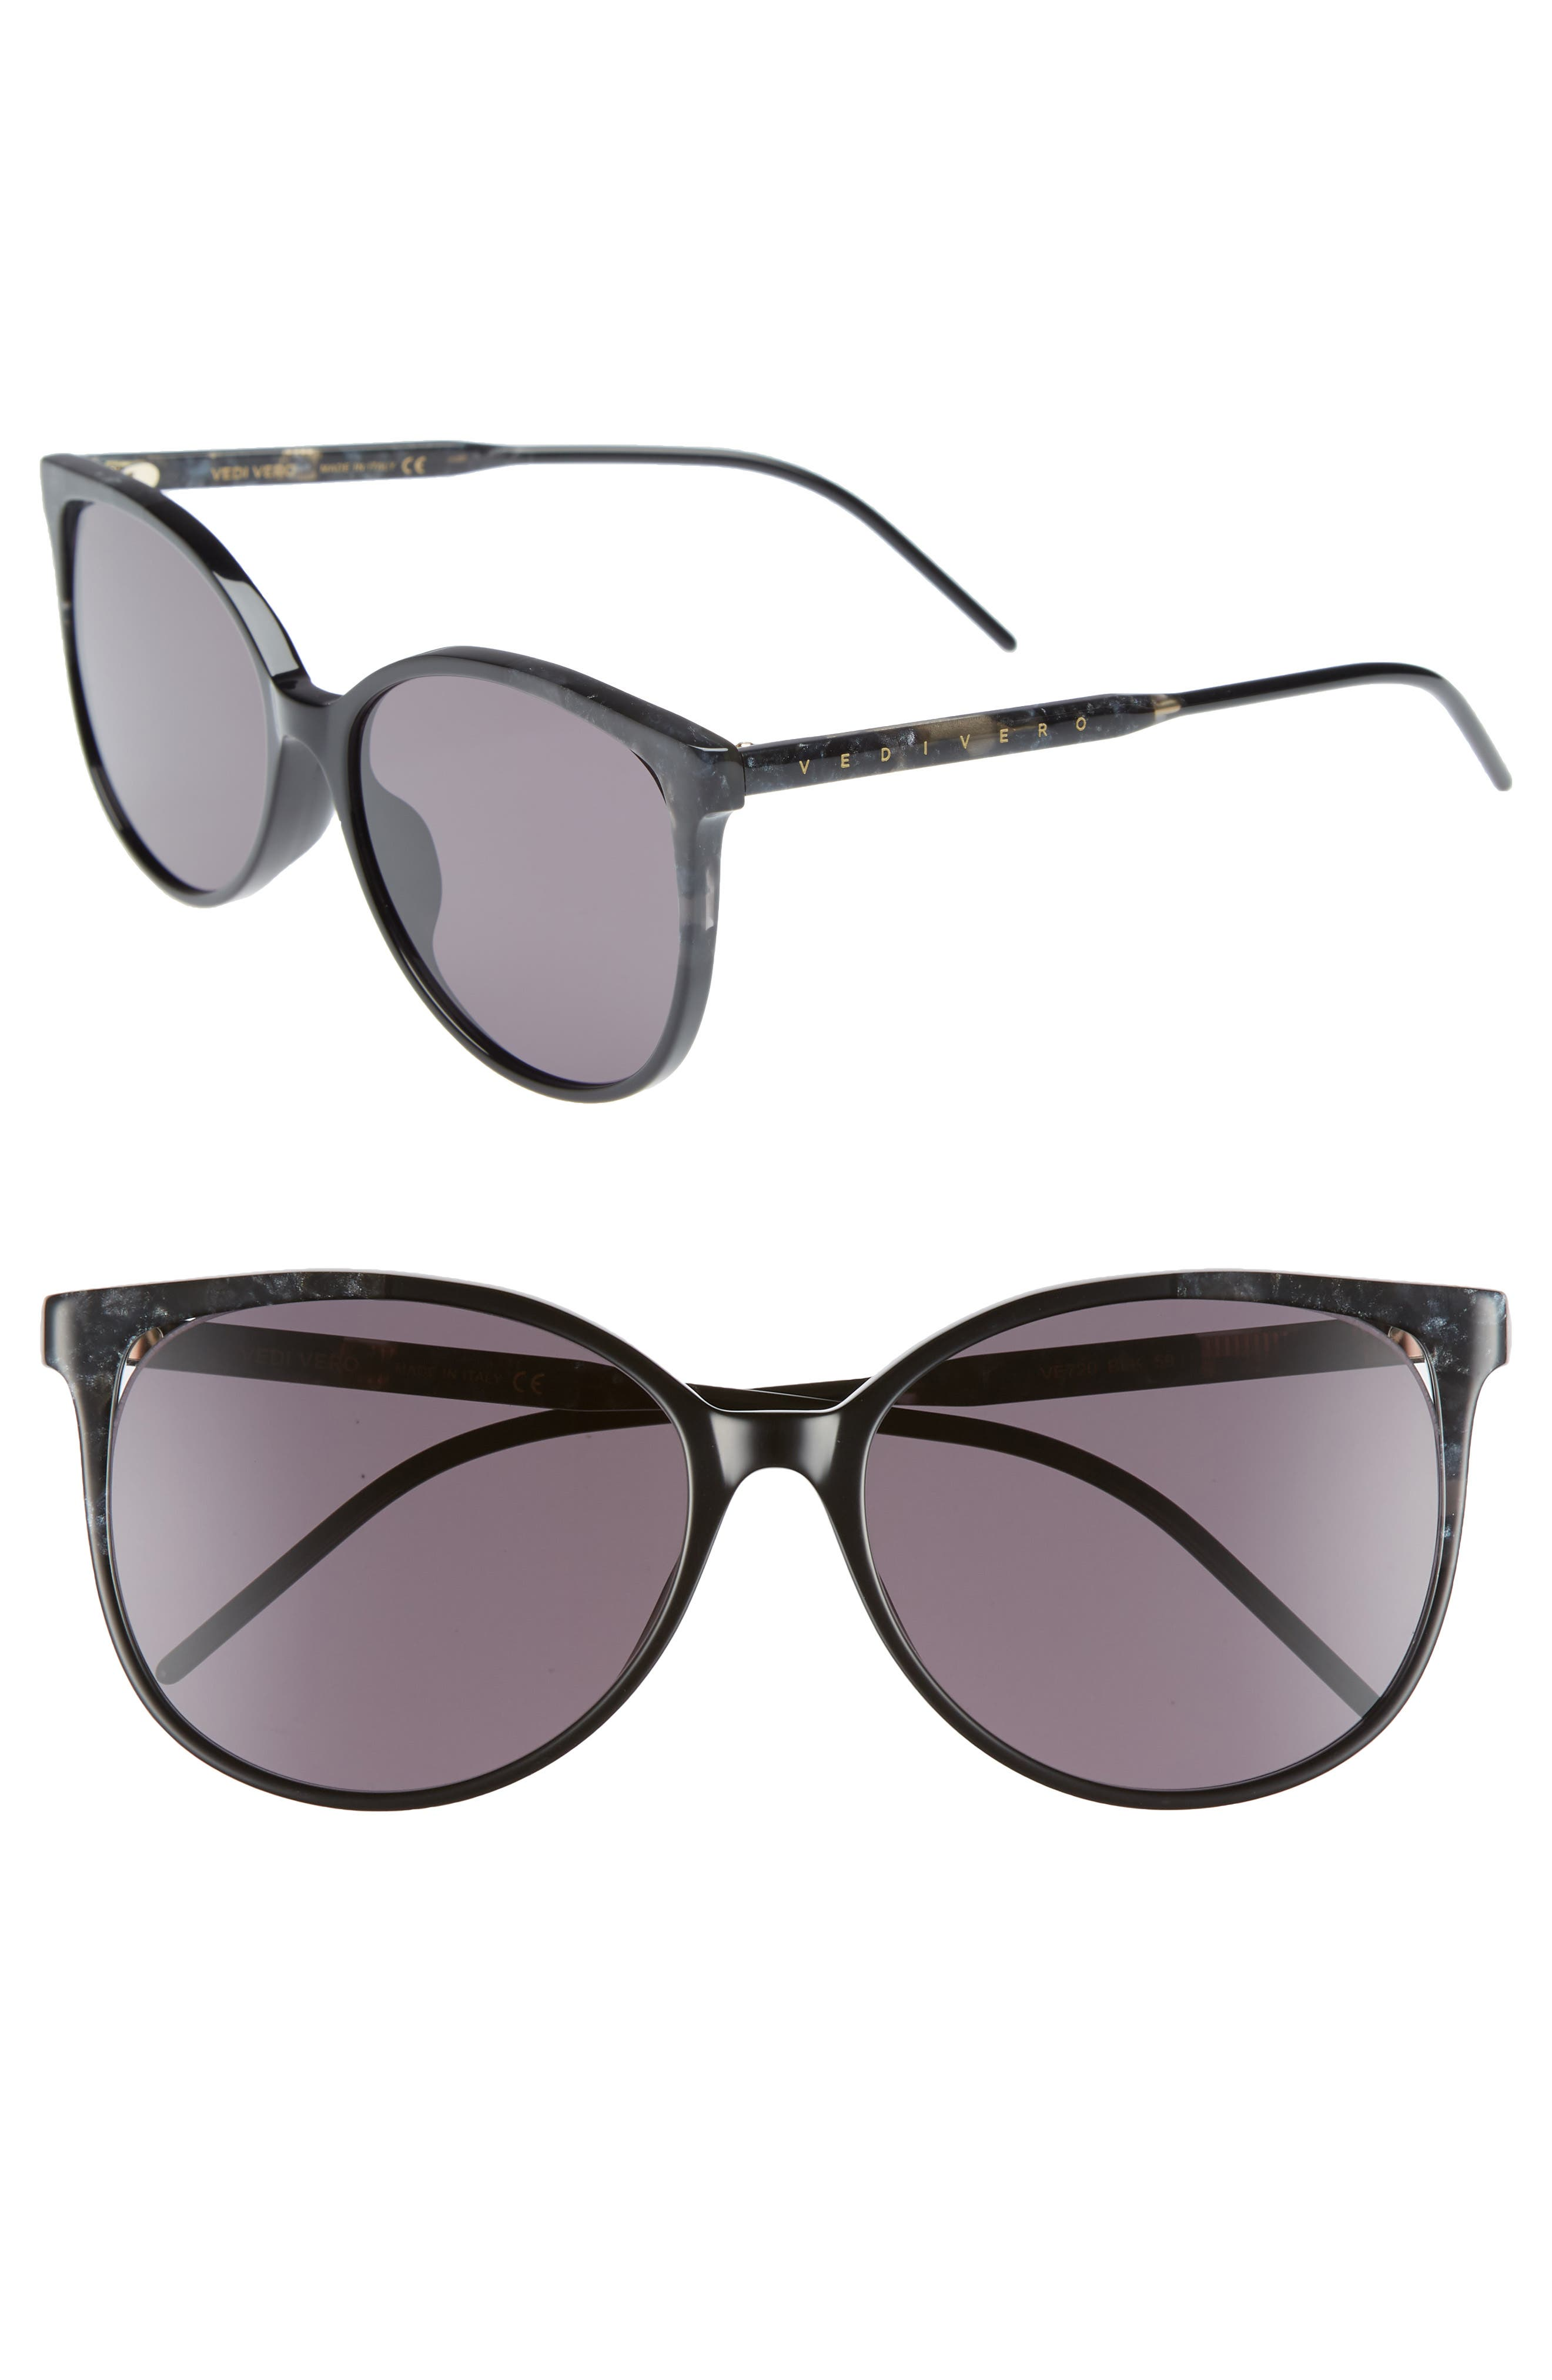 59mm Round Sunglasses,                             Main thumbnail 1, color,                             BLACK/BROWN